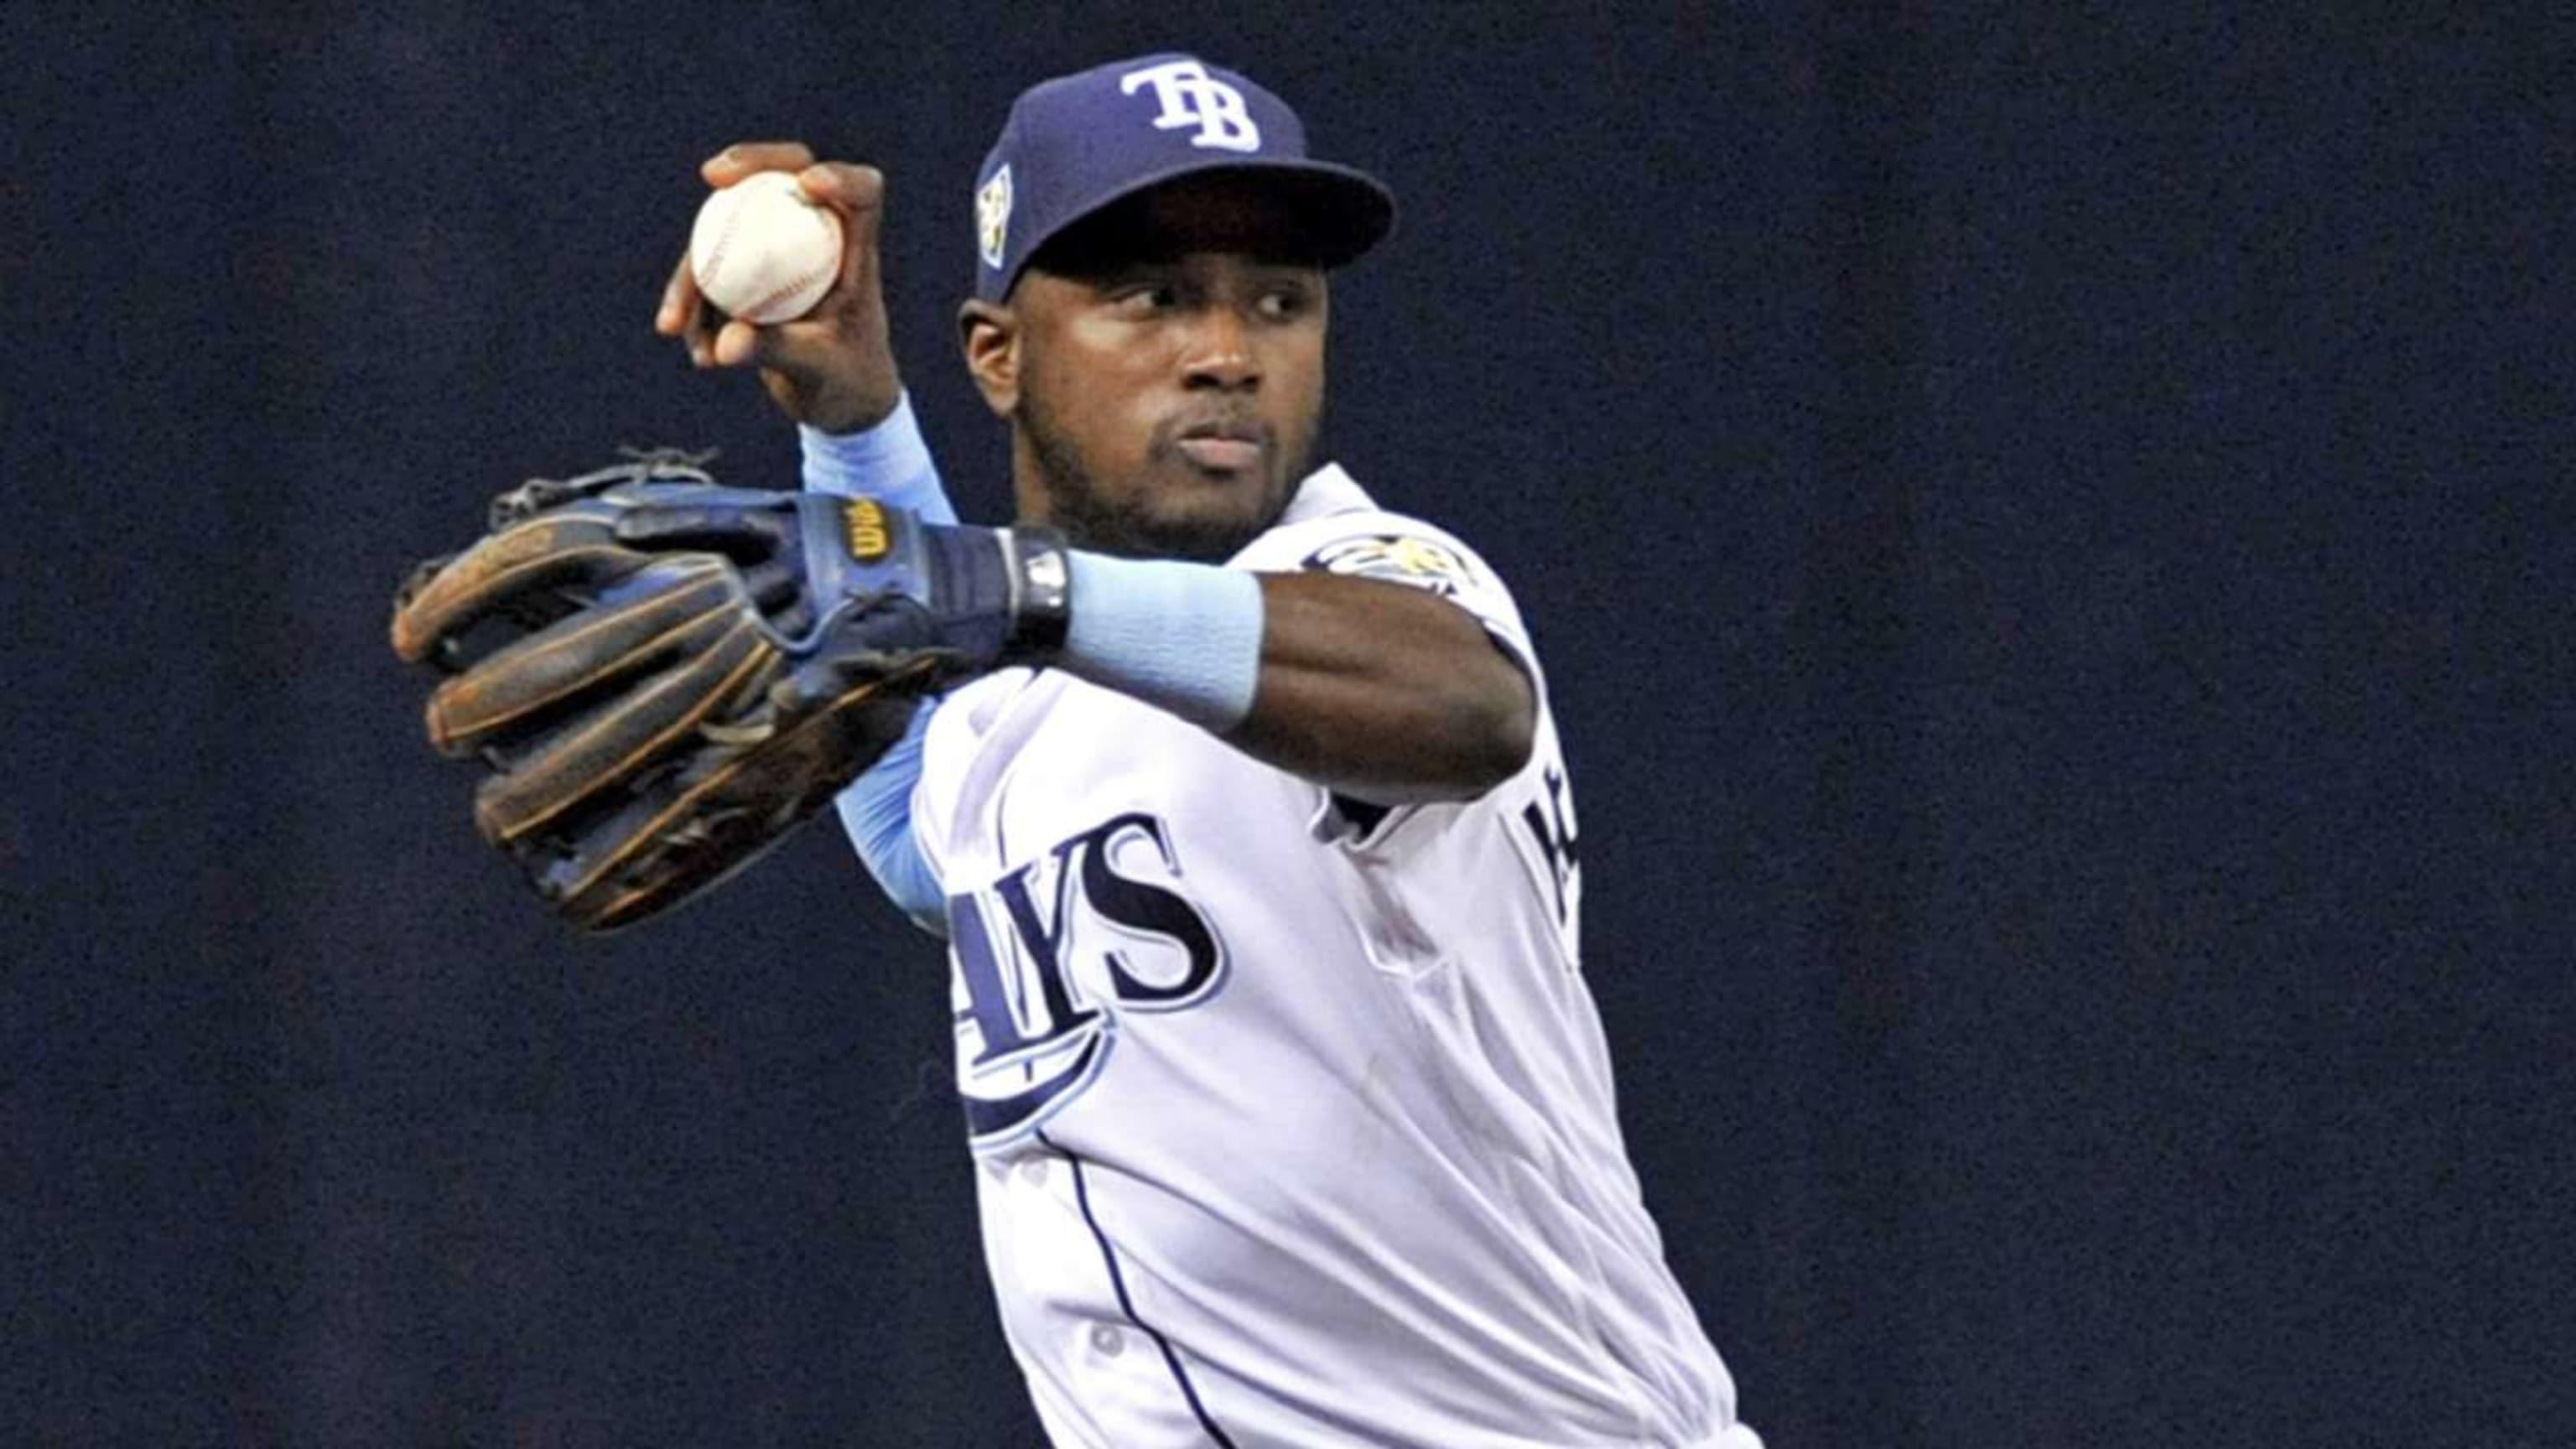 Adeiny Hechavarria Tampa Bay Rays Baseball Player Jersey